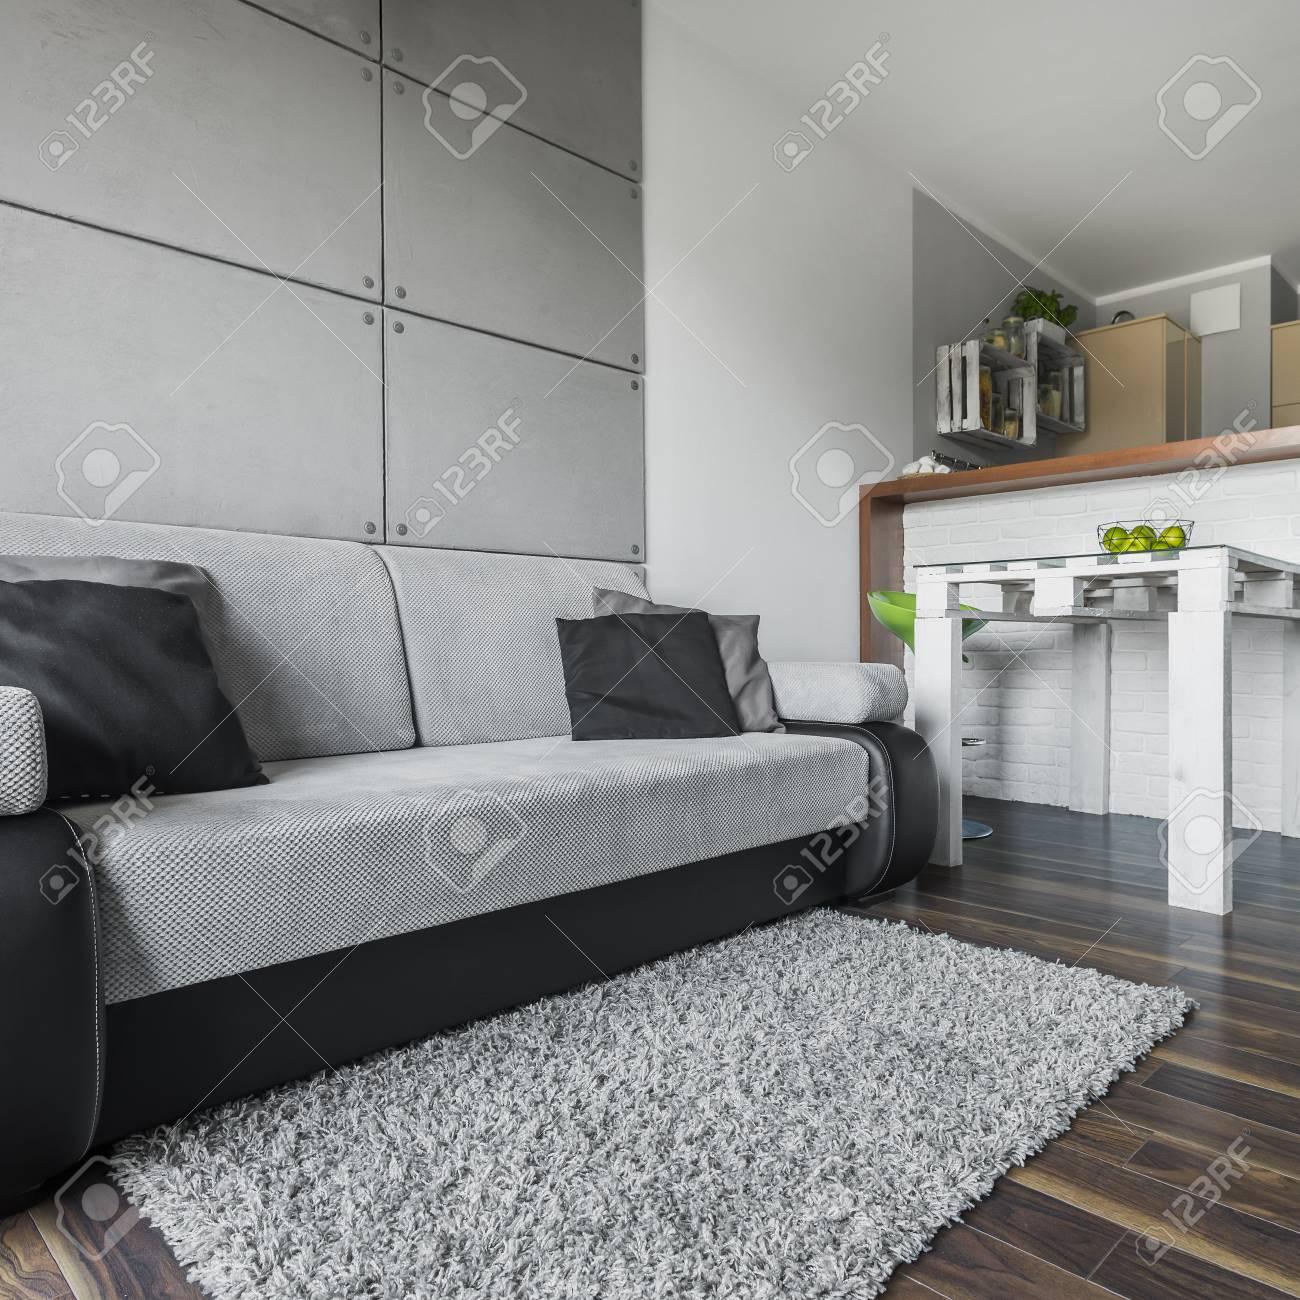 Comedores Modernos Para Apartamentos Pequeños   Ideas Con Muebles ...